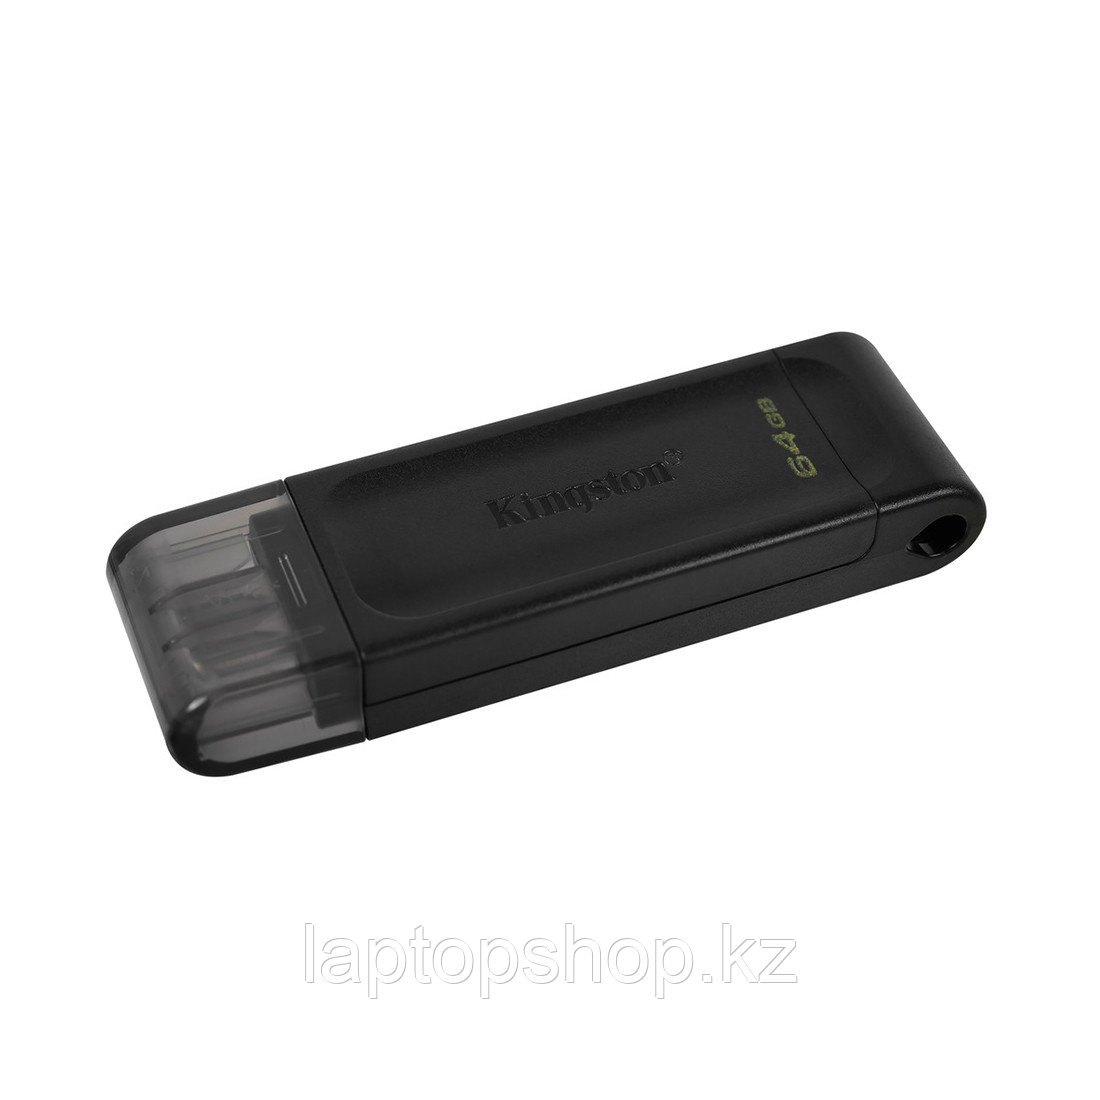 USB Flash Kingston DT70/64GB 64GB Type-C Чёрный